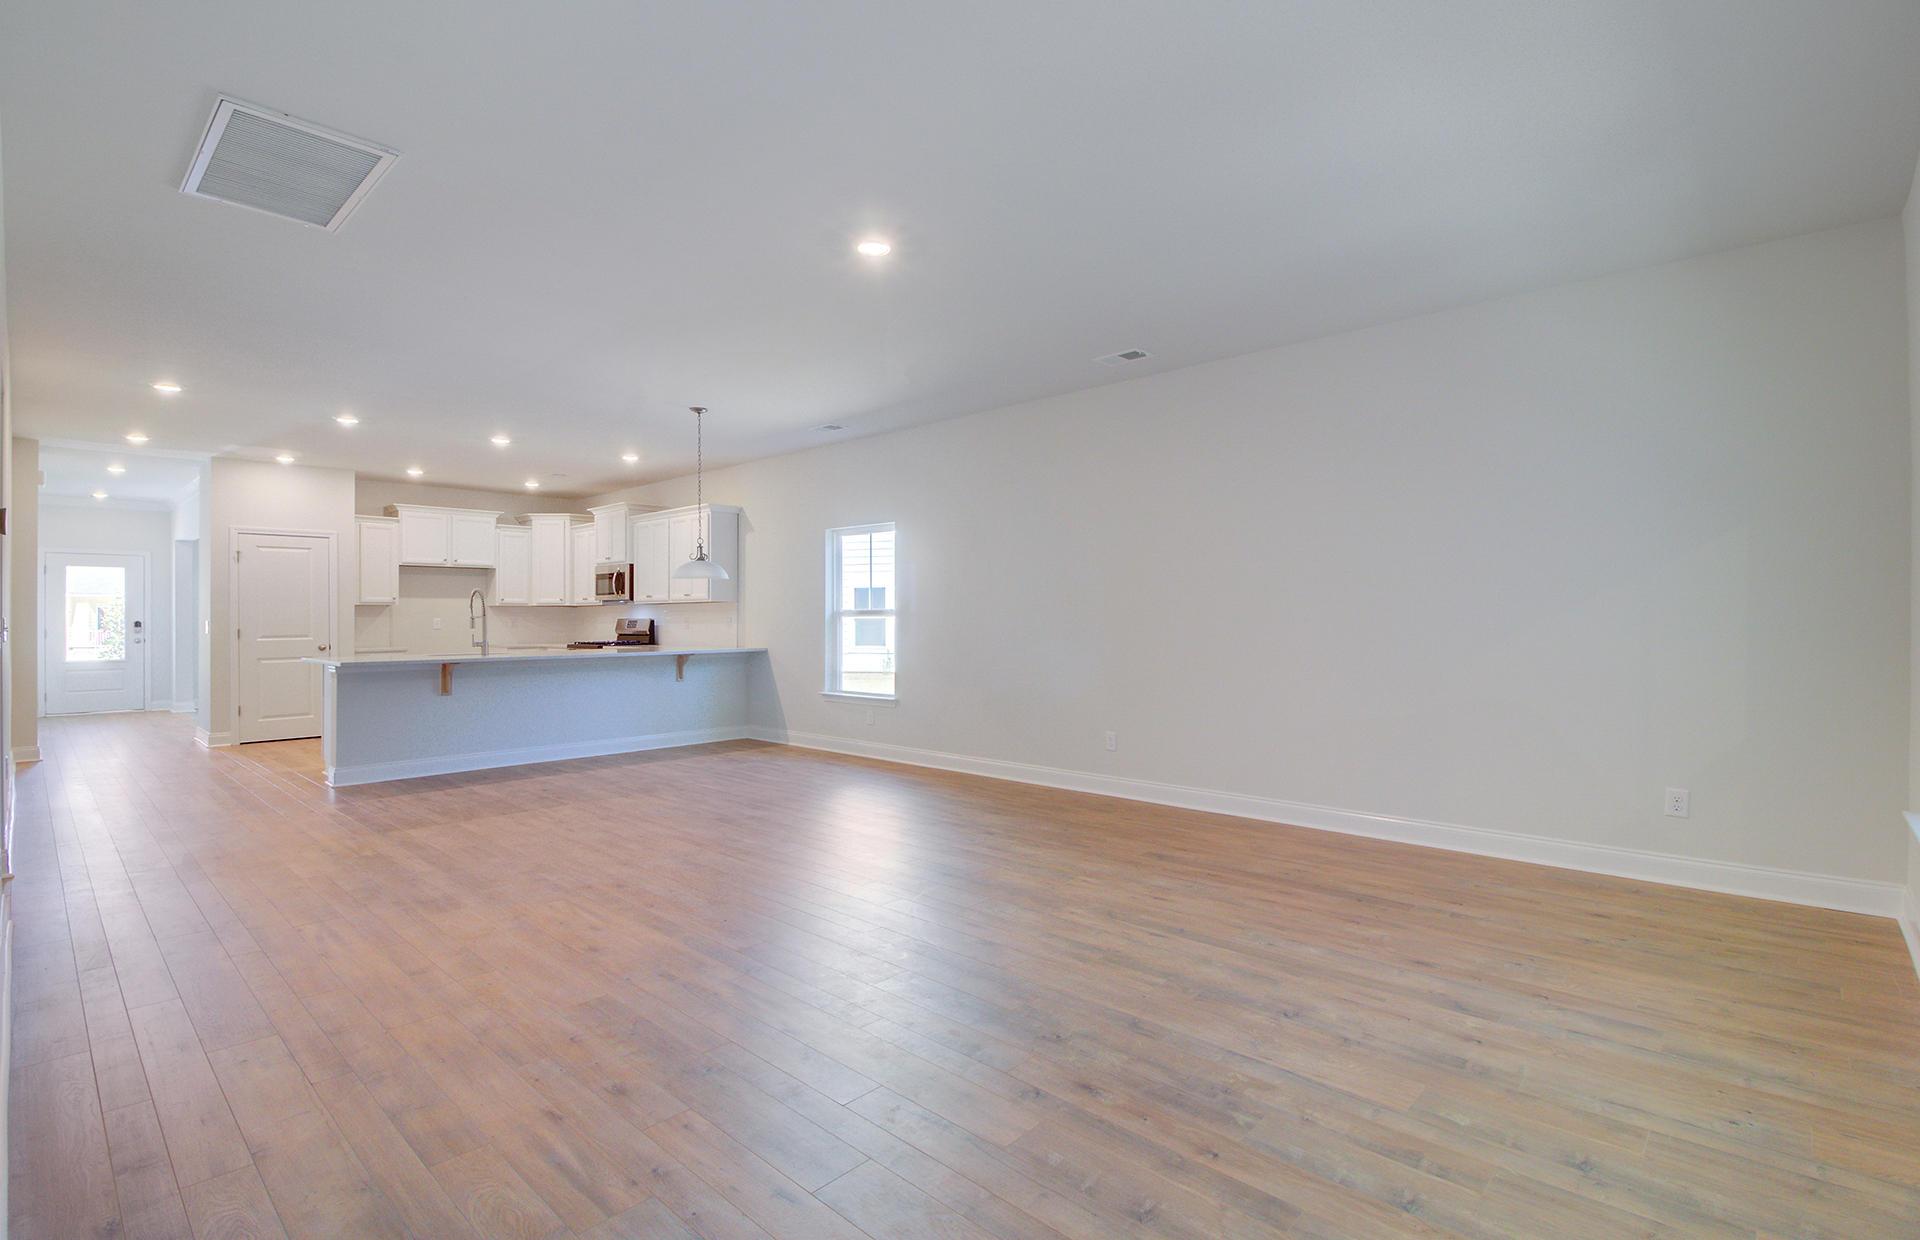 Park West Homes For Sale - 3030 Rice Field, Mount Pleasant, SC - 19